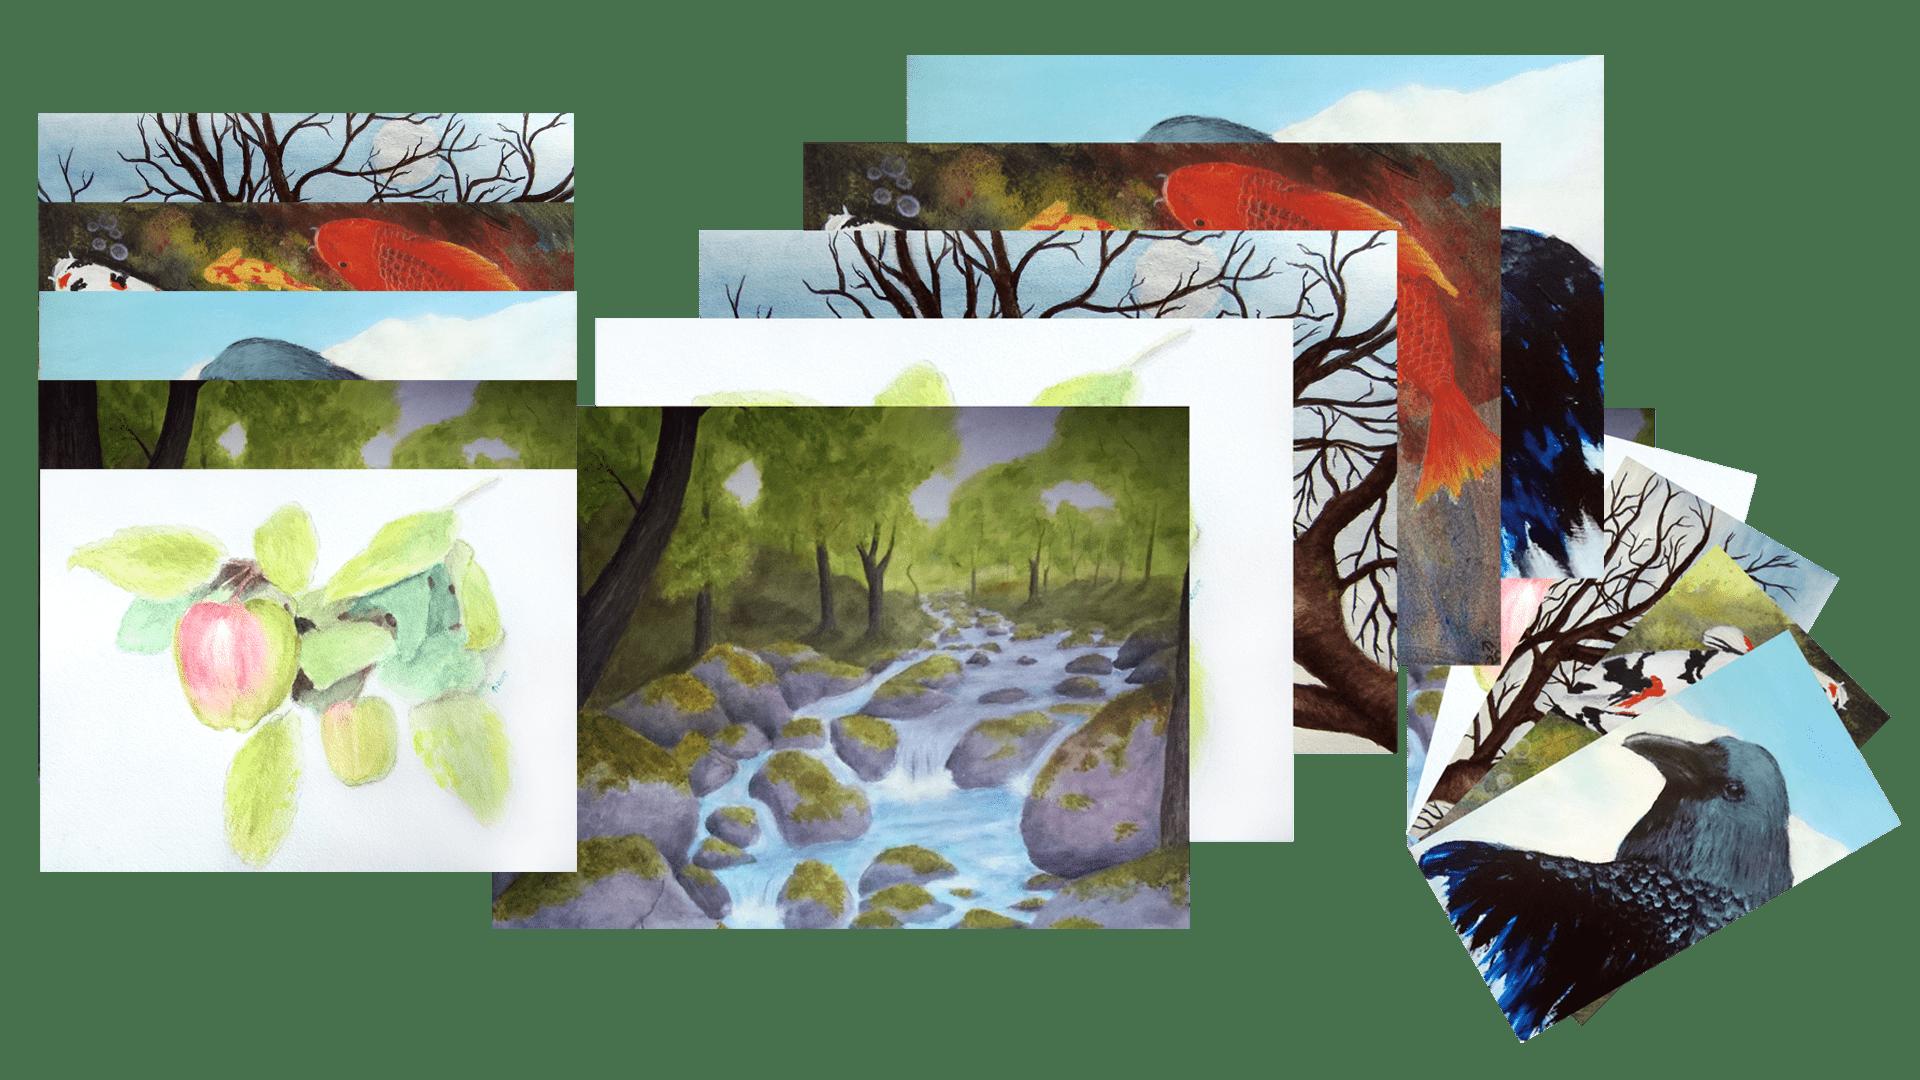 Free art wallpapers